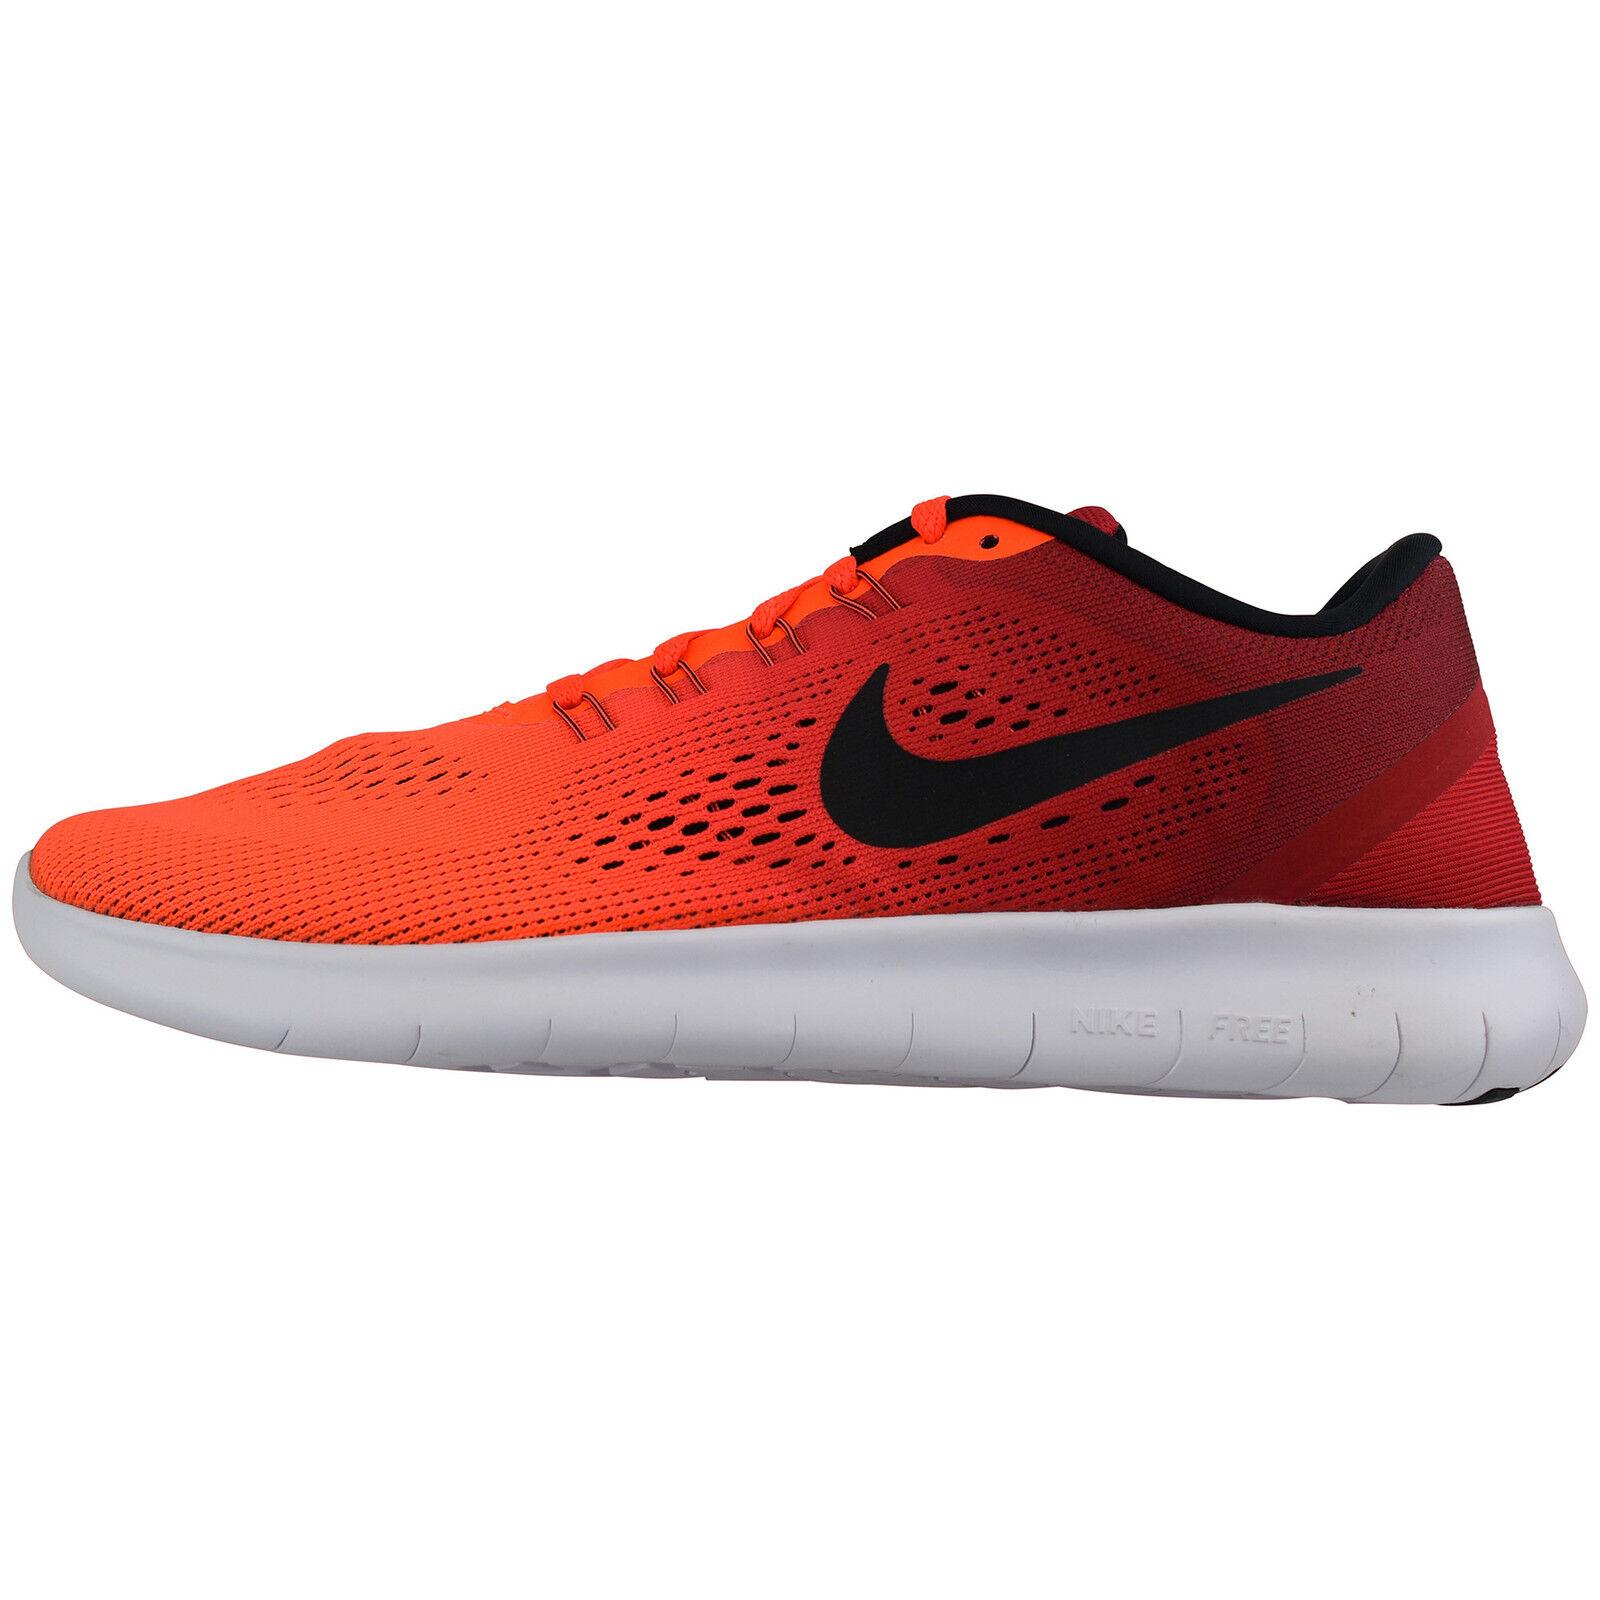 WMNS Nike Free RN 831509-801 LIFESTYLE Scarpe da corsa running tempo libero Sneaker